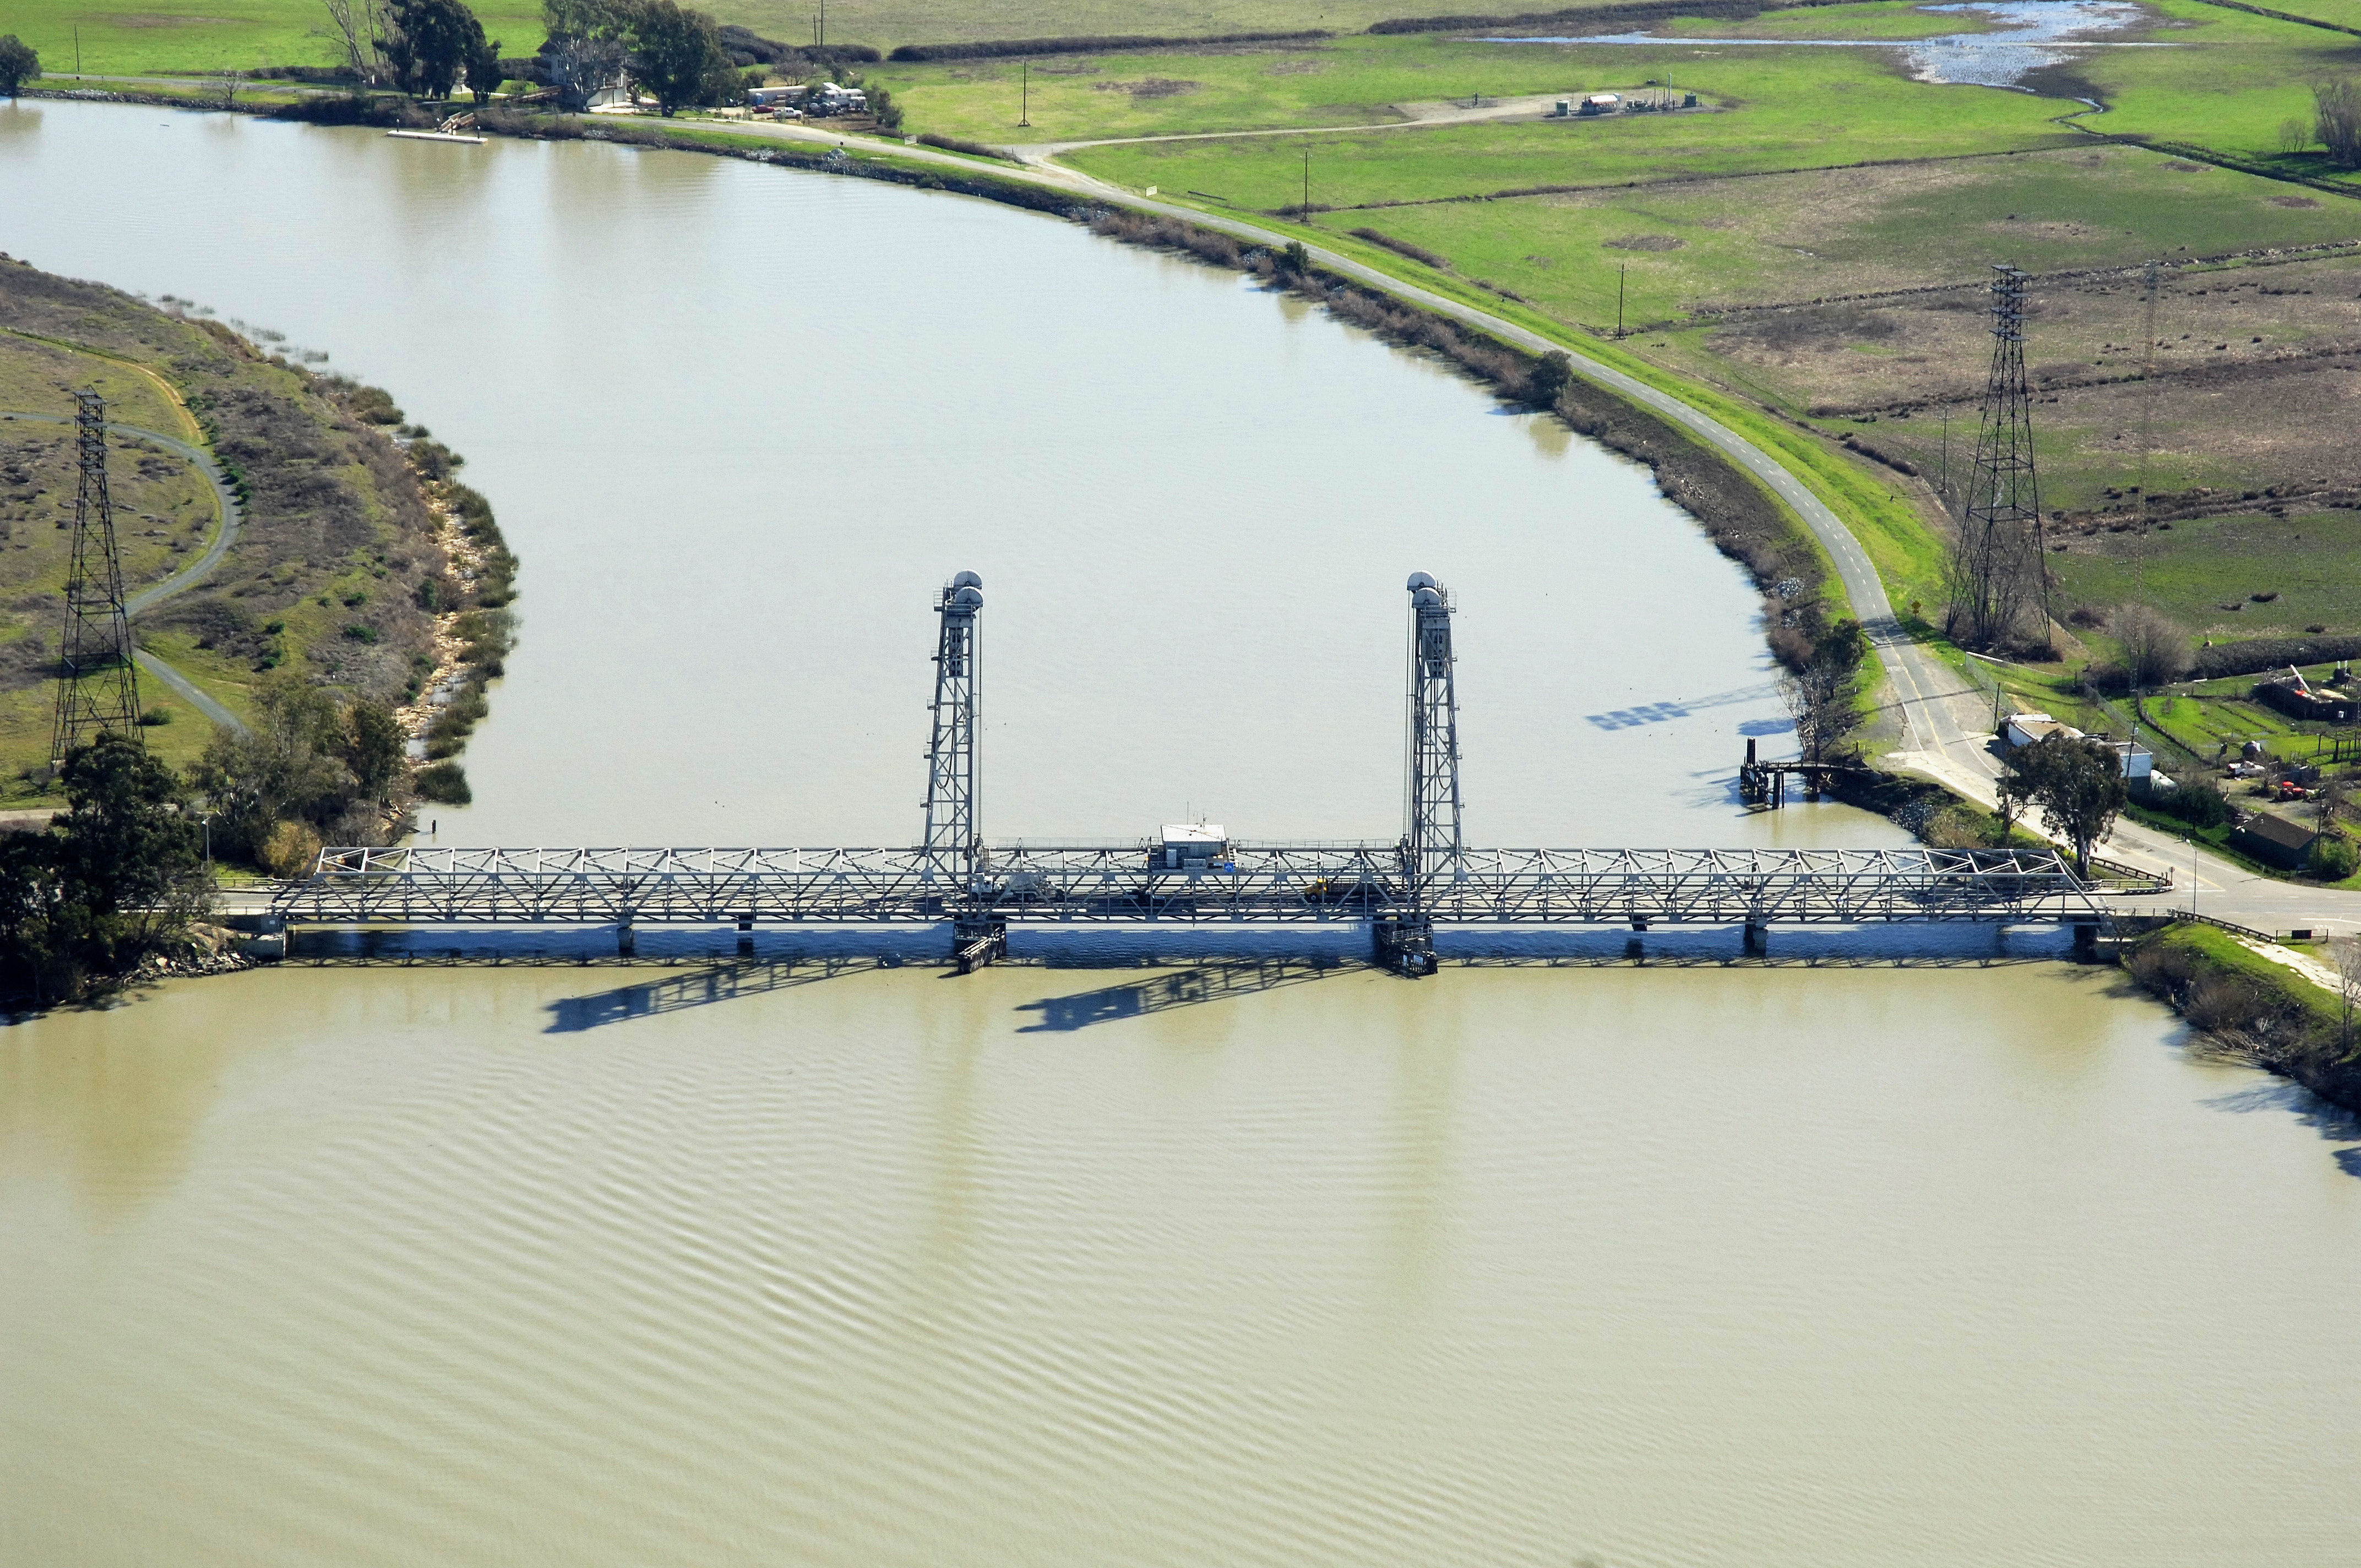 Threemile slough lift bridge in ca united states bridge reviews threemile slough lift bridge geenschuldenfo Image collections